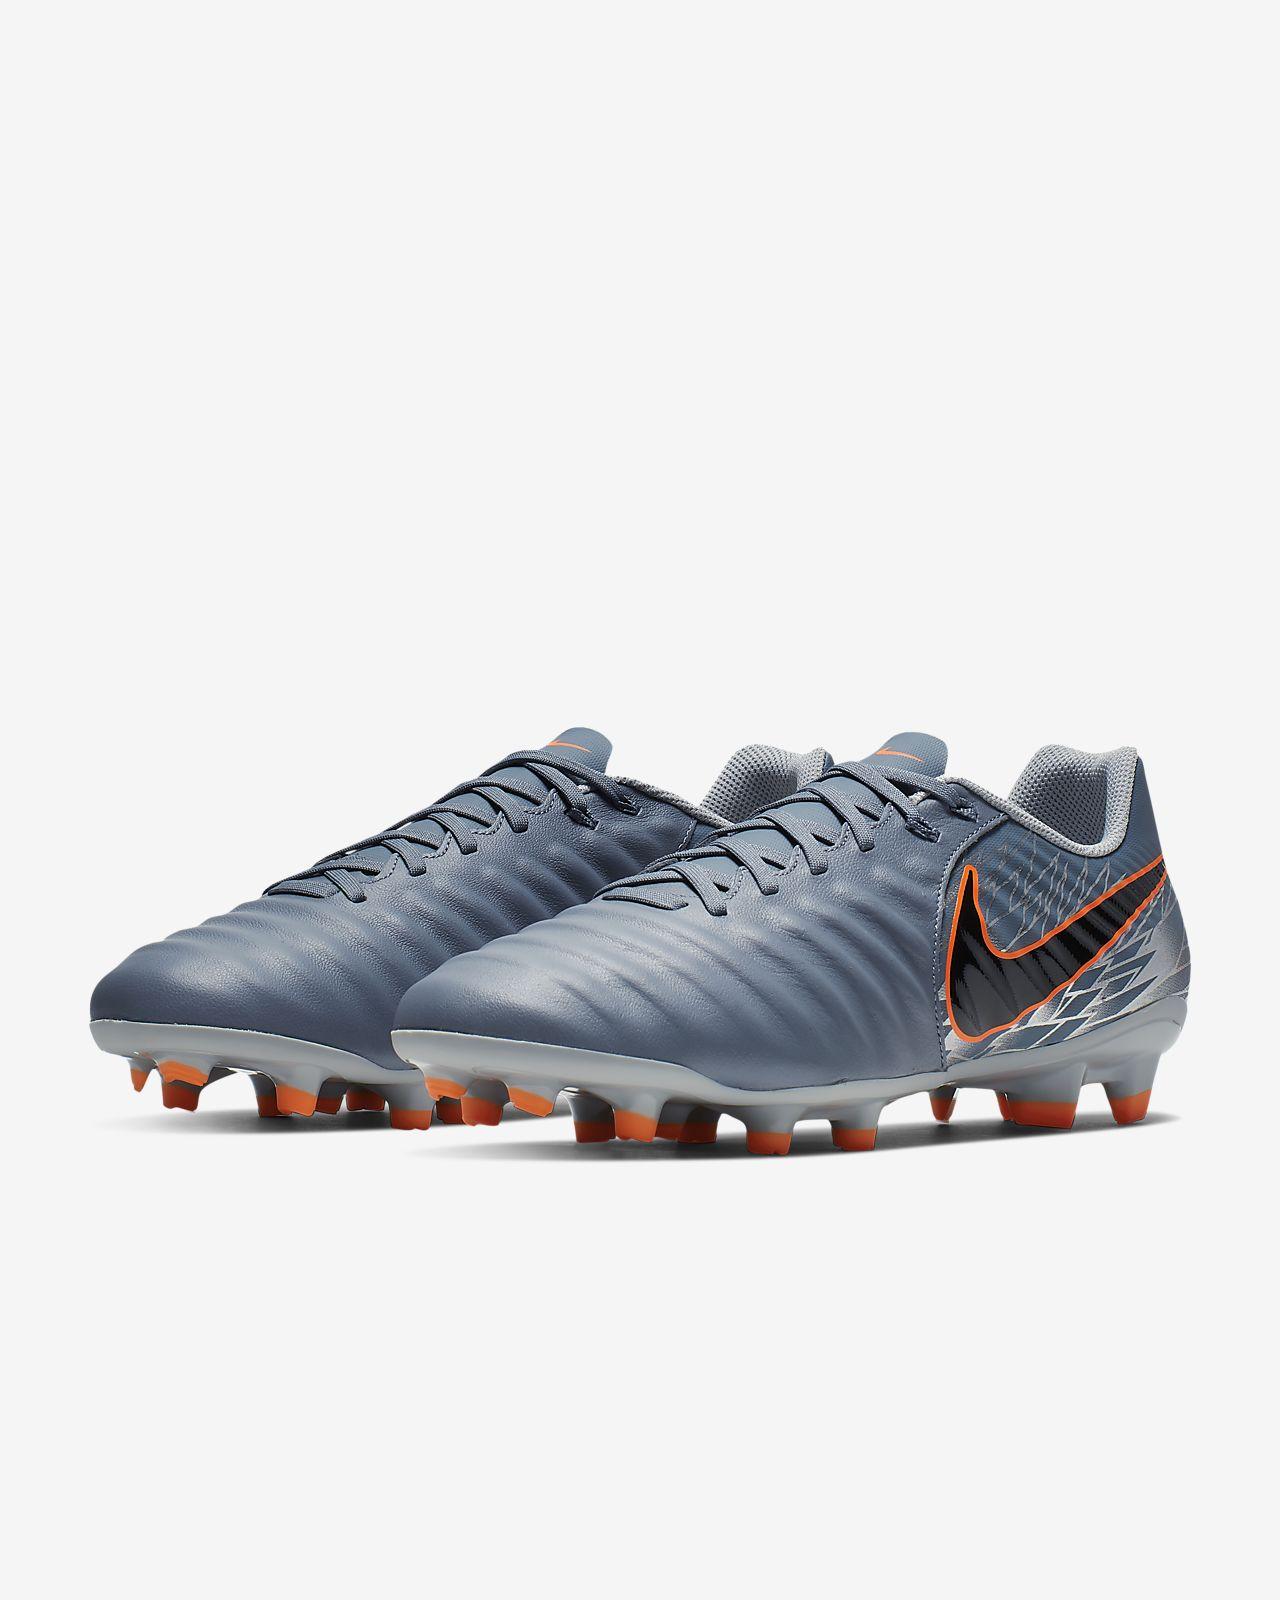 c11a3e32 ... Calzado de fútbol para terreno firme Nike Tiempo Legend VII Academy